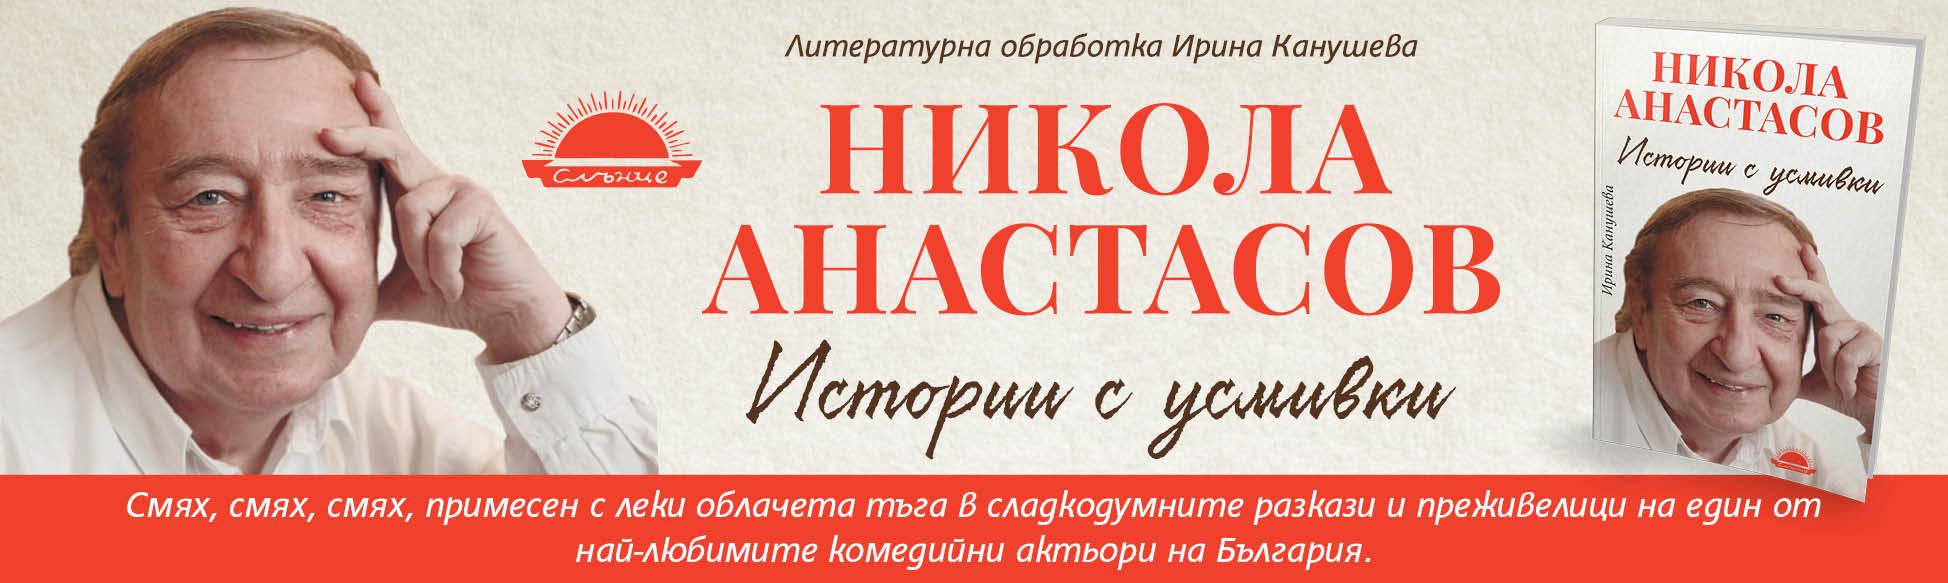 banner-n-anastasov